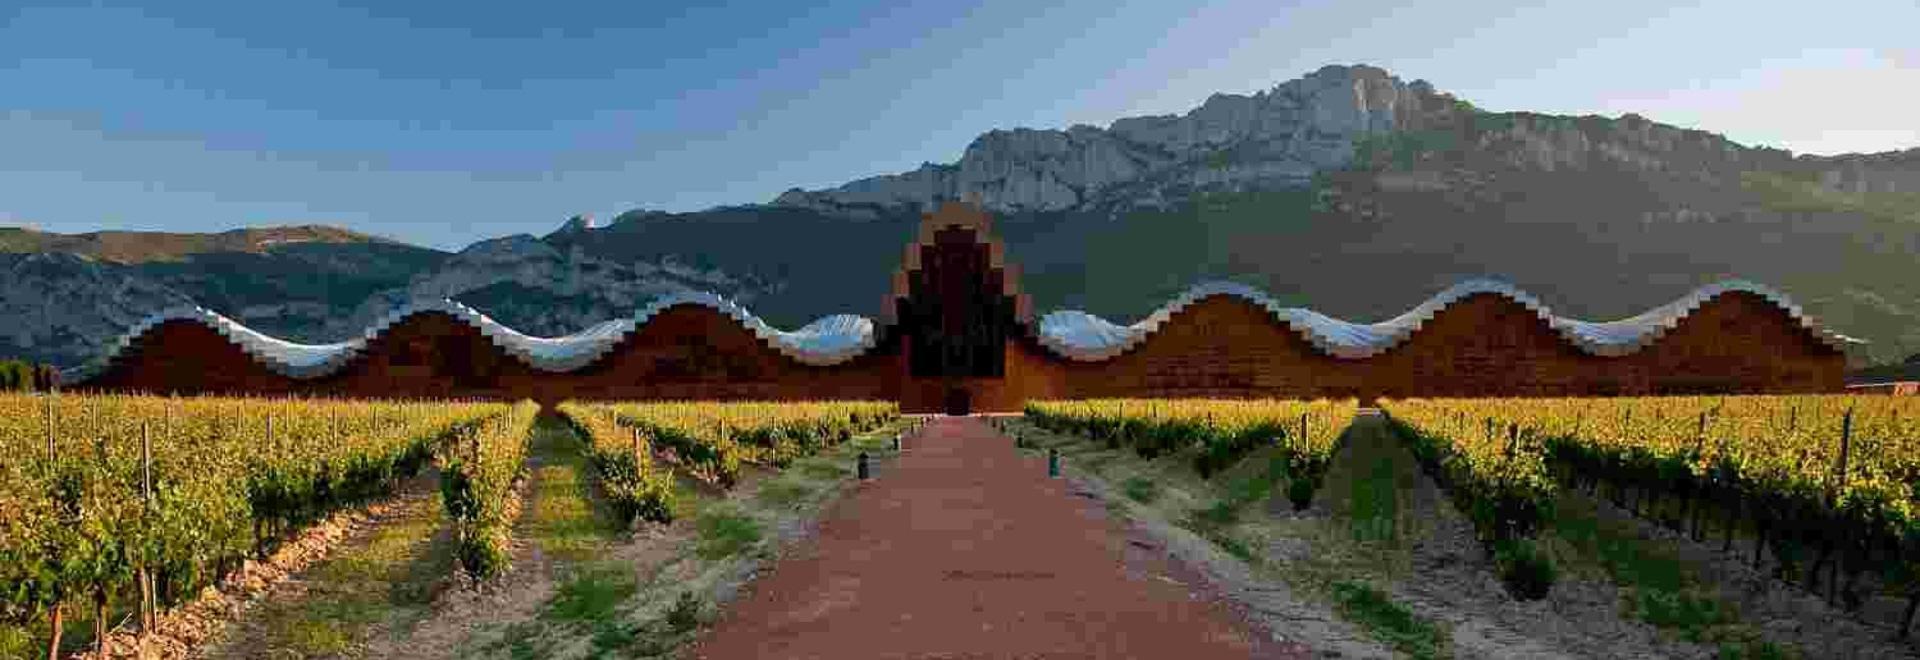 Bodega Ysios – Rioja. Courtesy of architect Santiago Calatrava